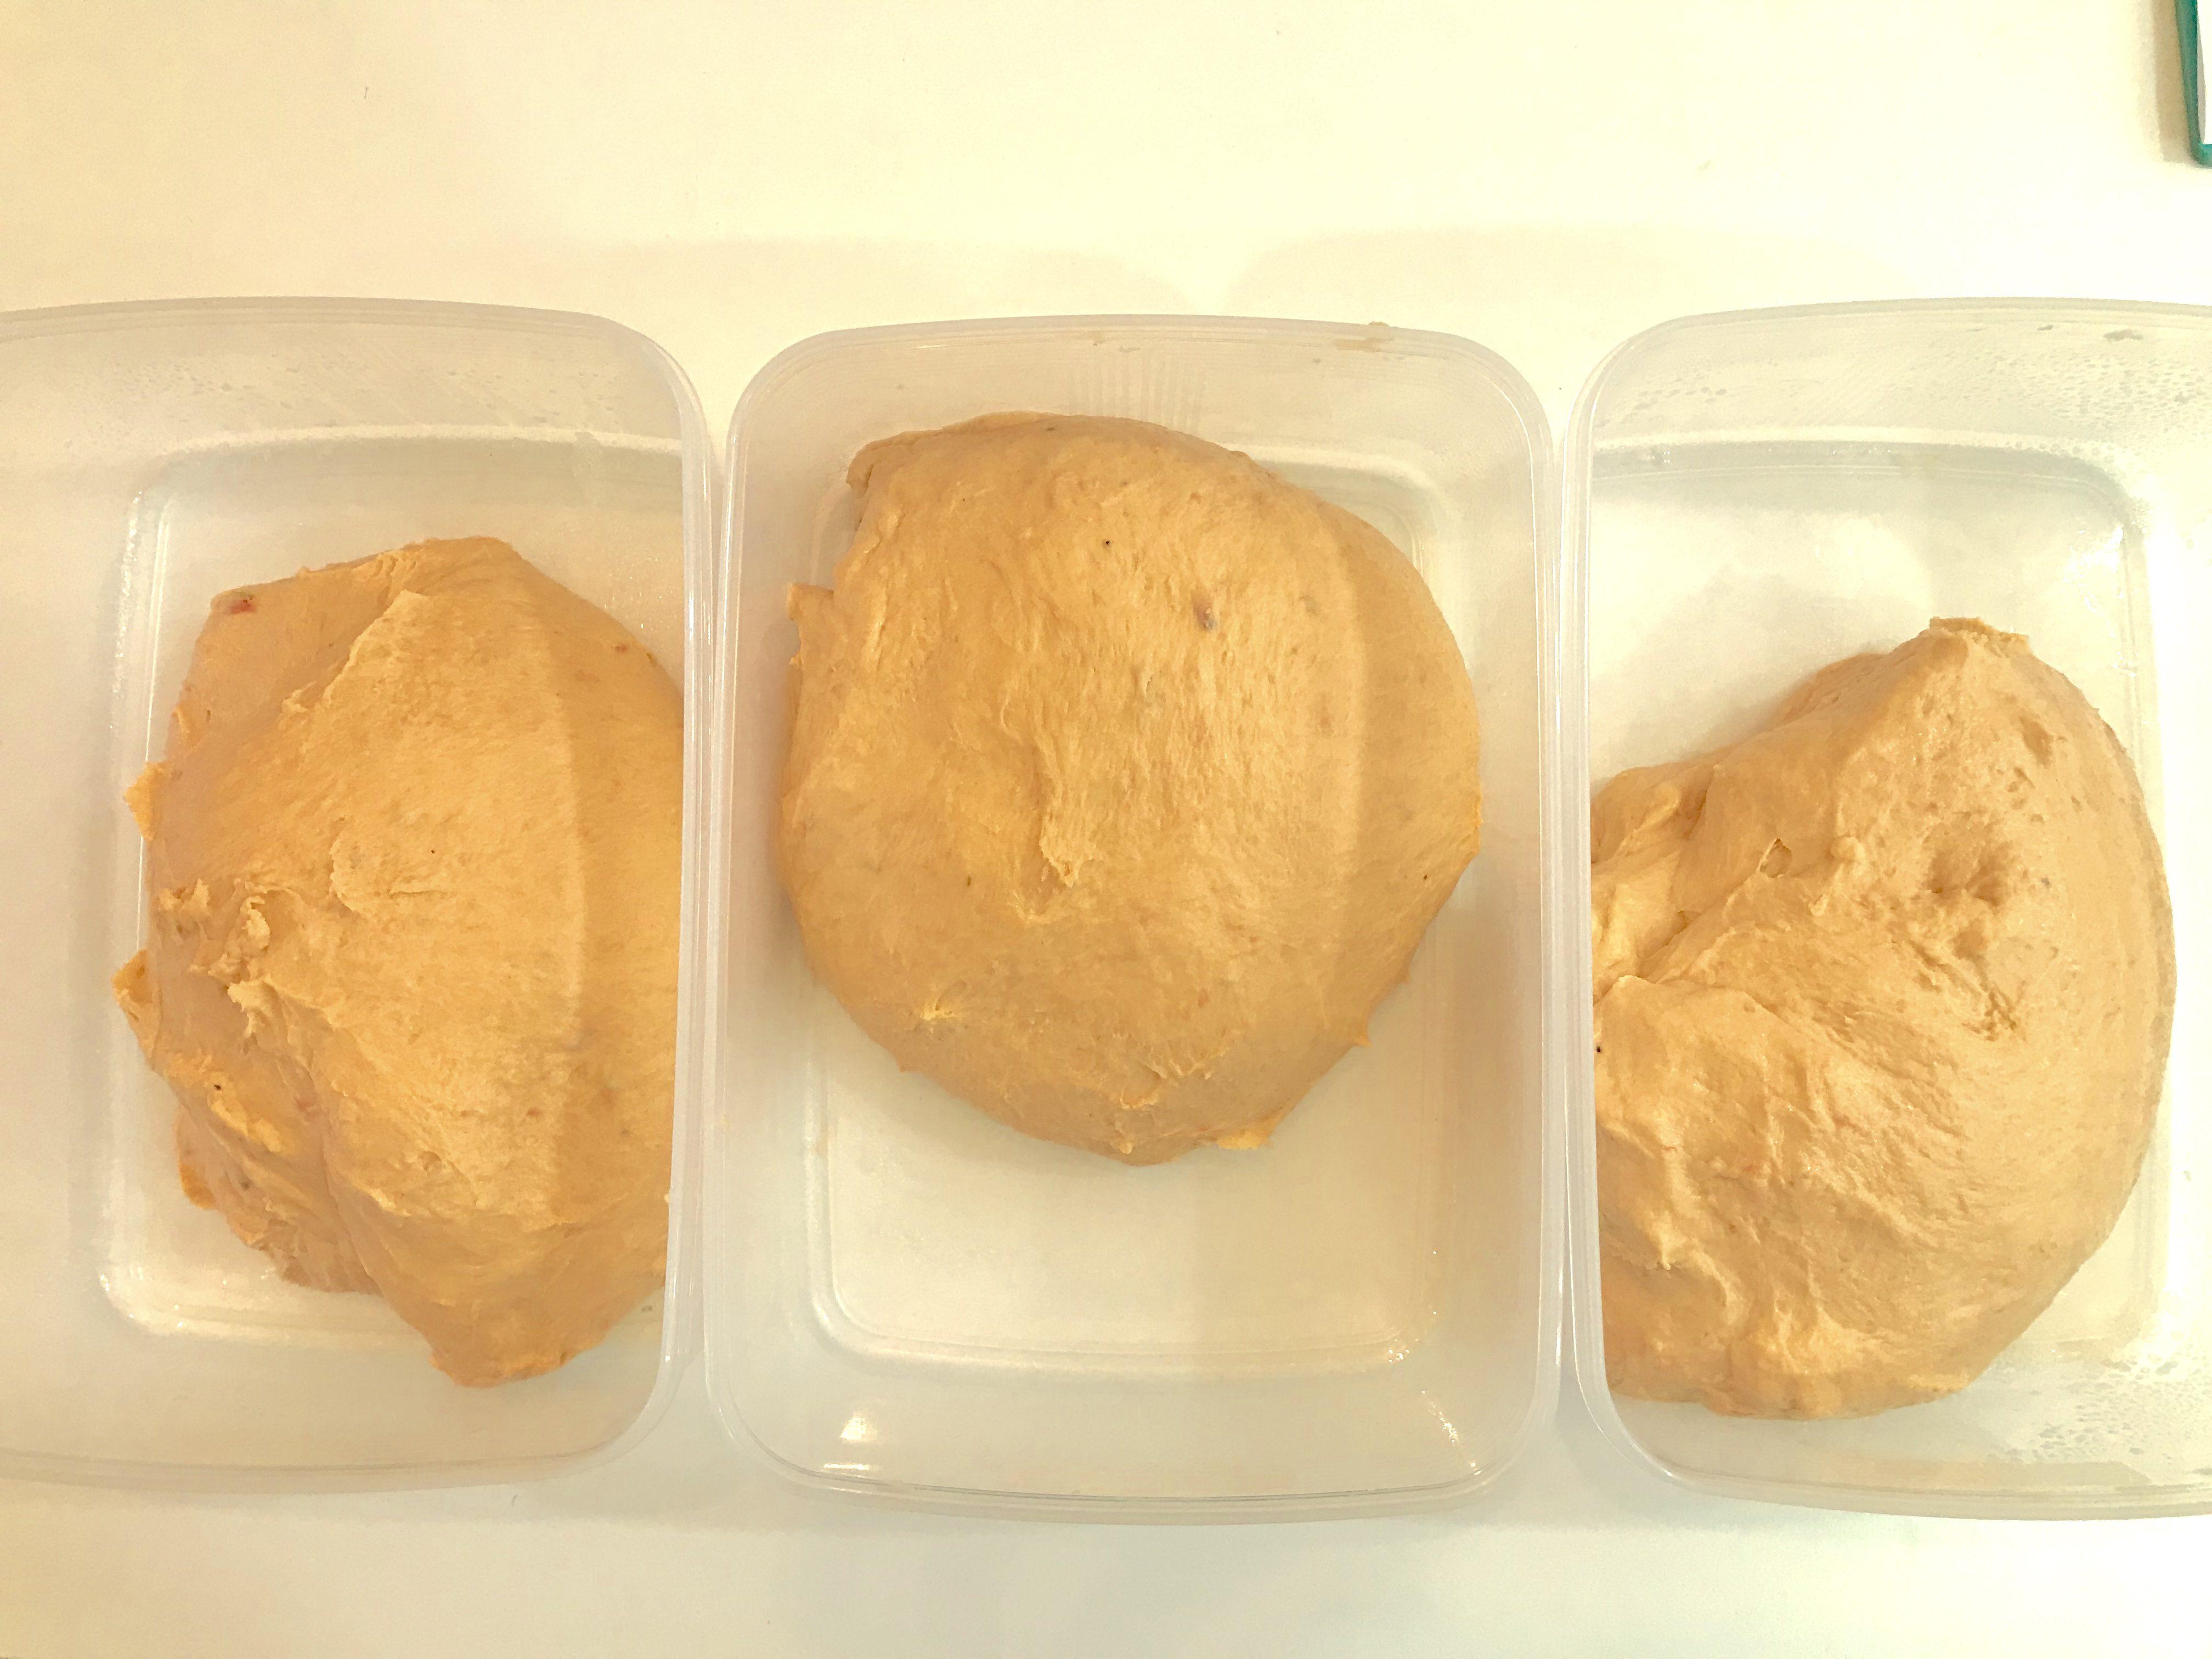 a-ta-sante糖質制限パン料理教室。阿倍野区。桃ヶ池町。a-ta-sant'e.京都江部粉糖質オフパン。利野郁枝。